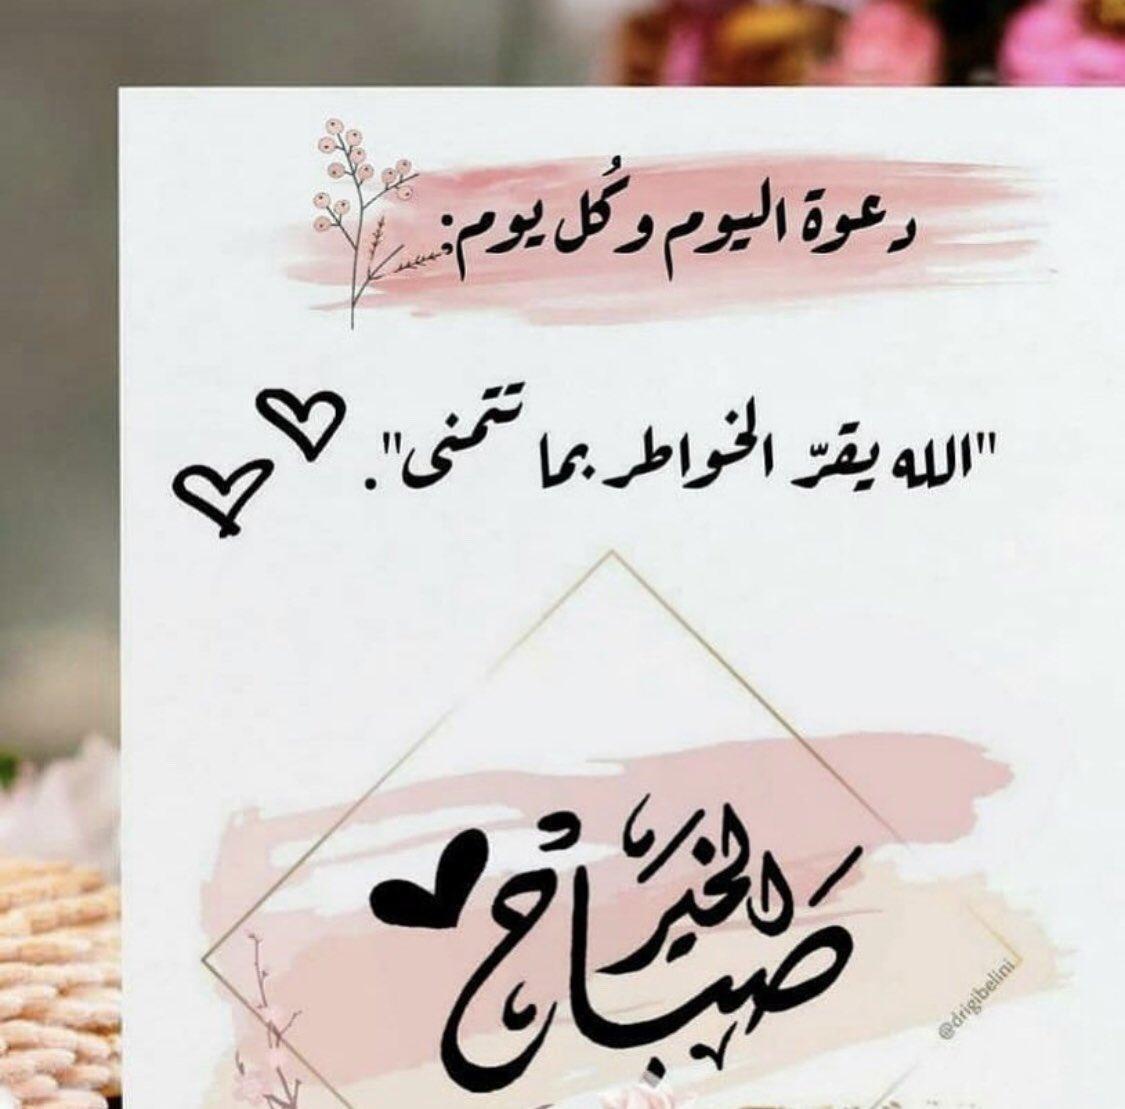 Hashtag صباحيه Na Twitteru